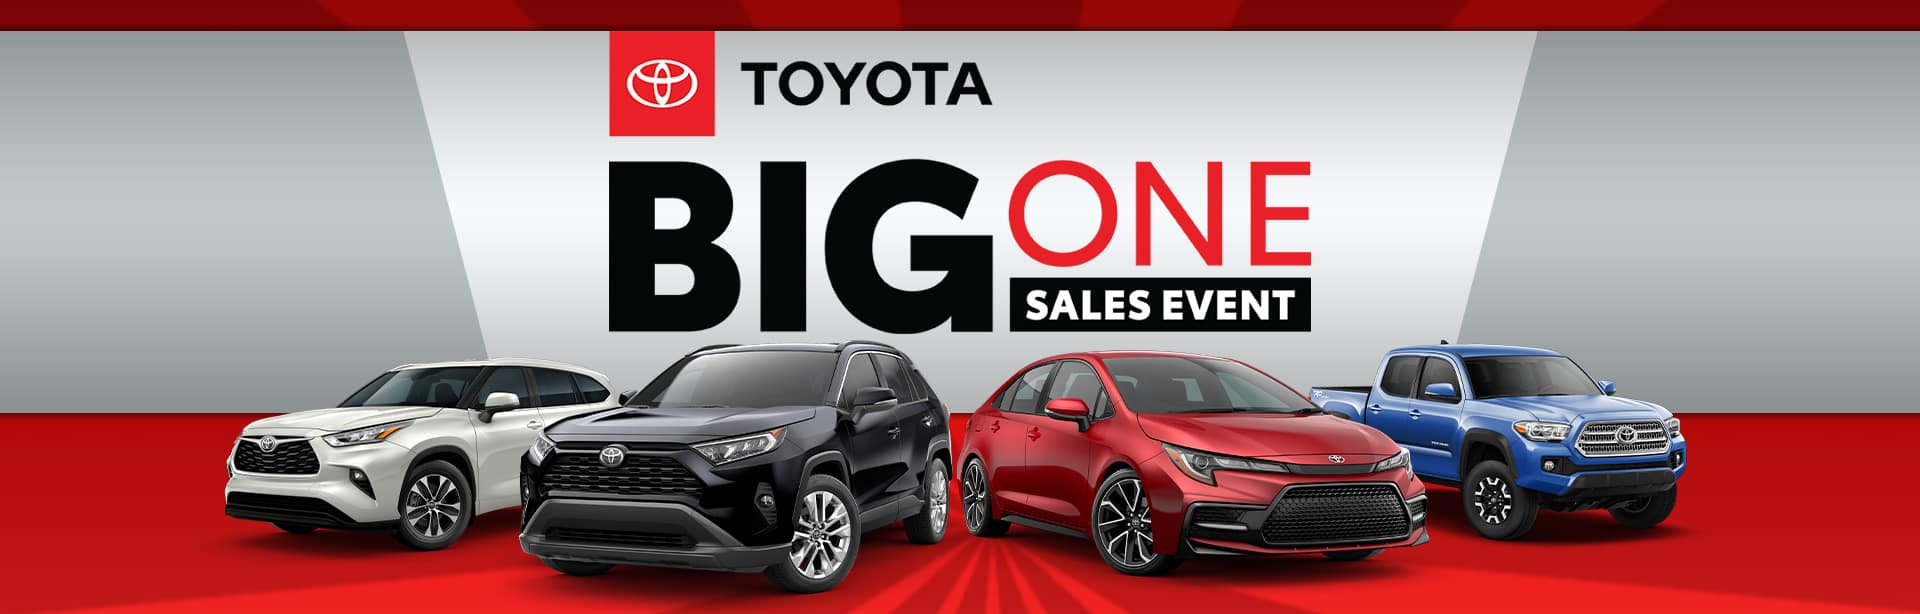 Big One Sales Event